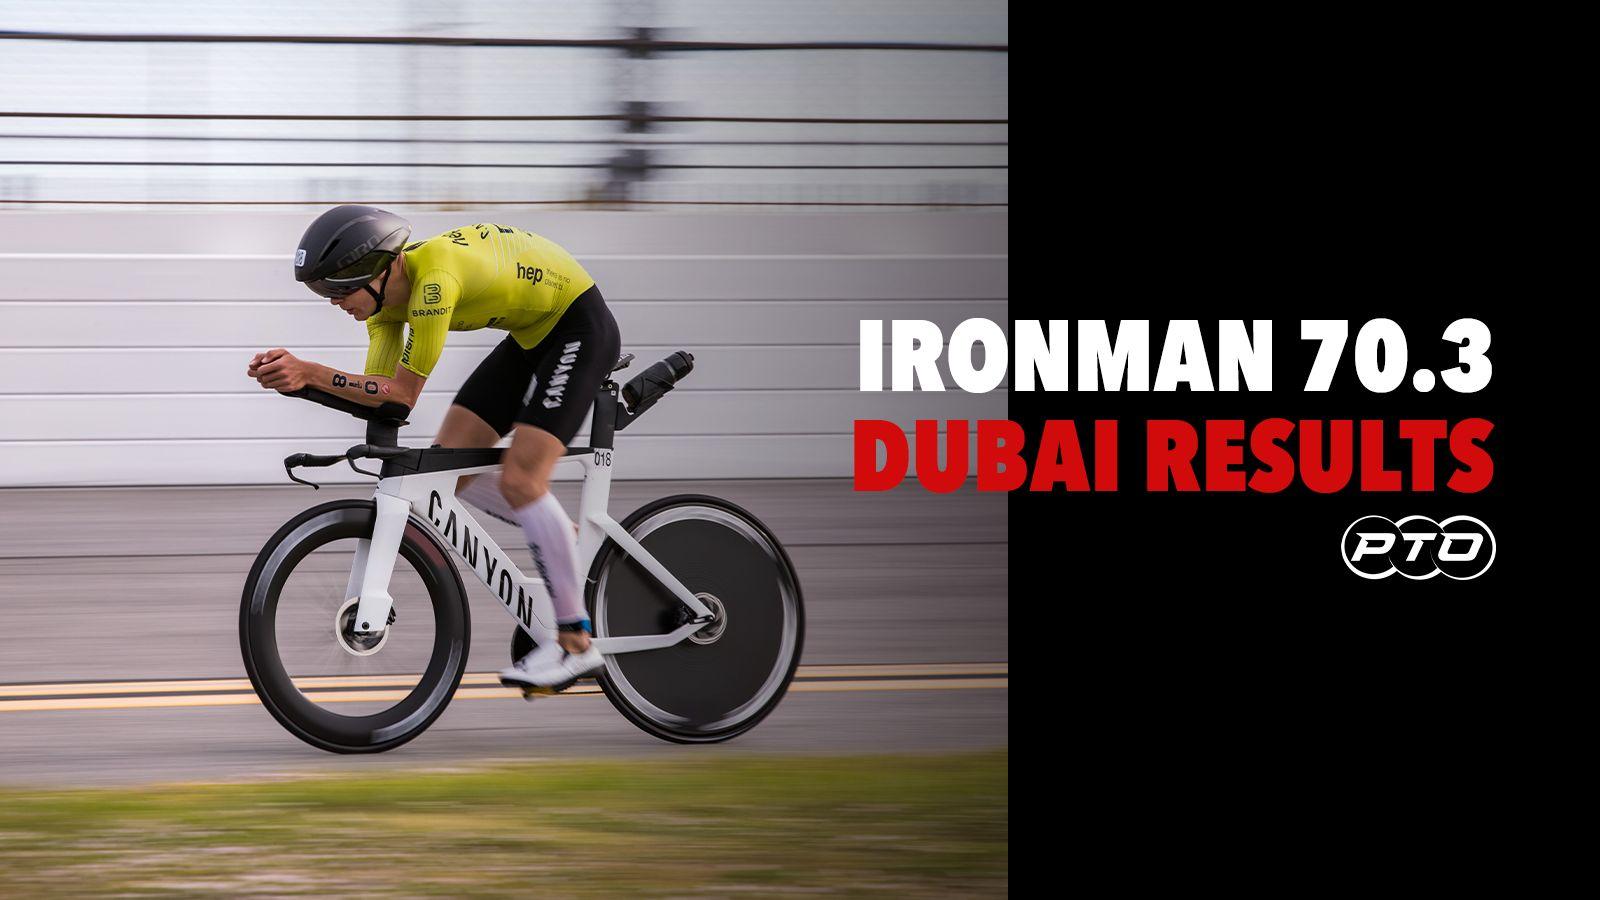 Ironman 70.3 Dubai: Results